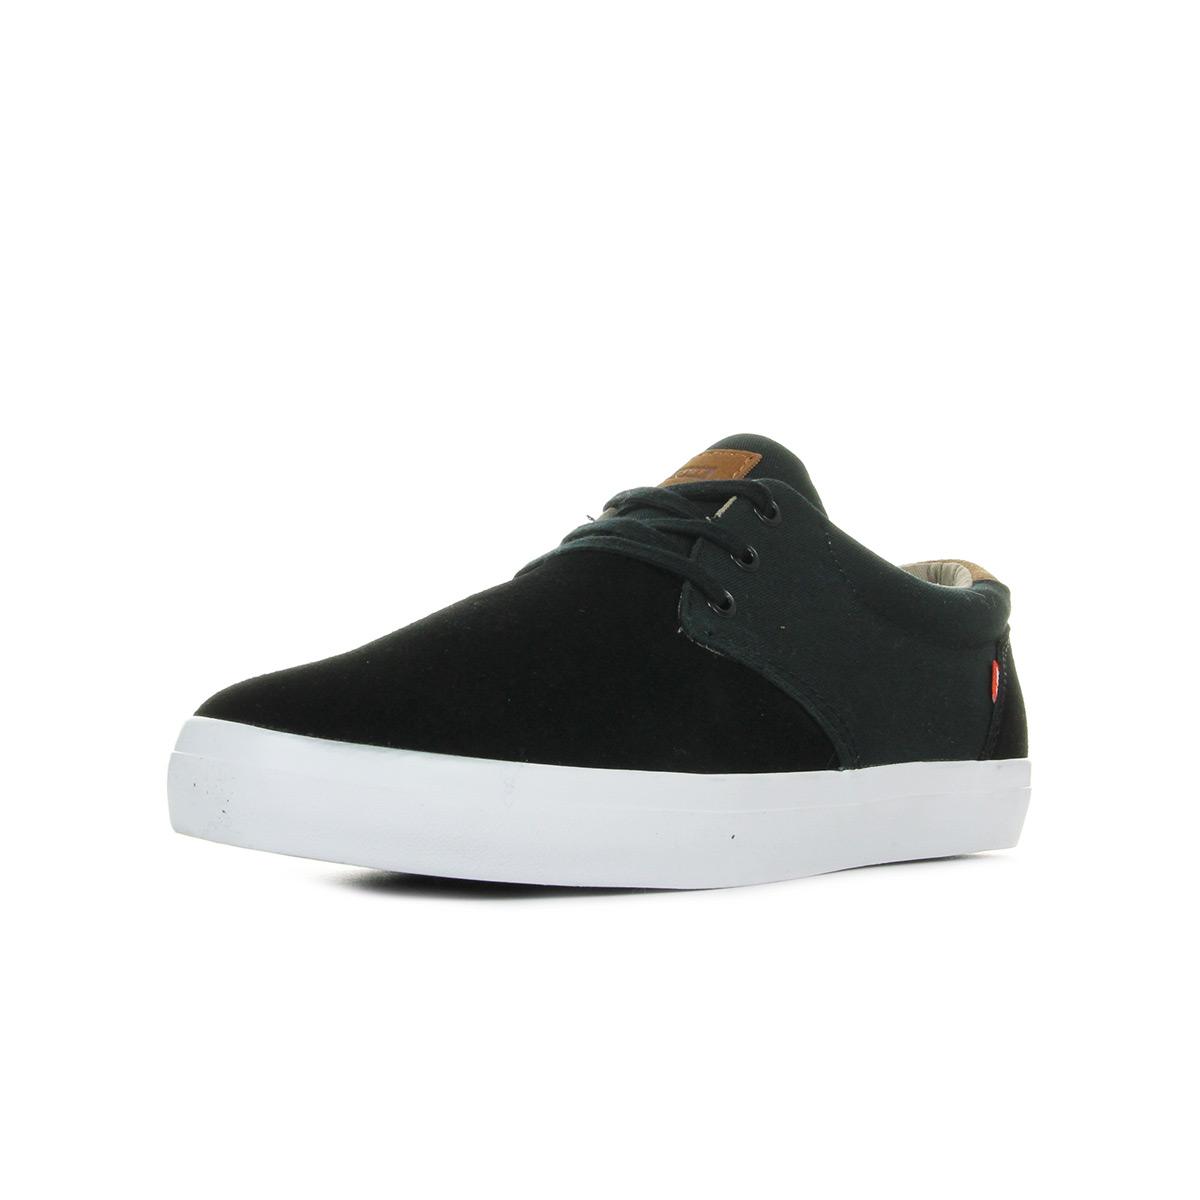 Globe Willow, Chaussures de Skateboard Homme, Noir (Black/Woodsmoke Brown 0), 43 EU